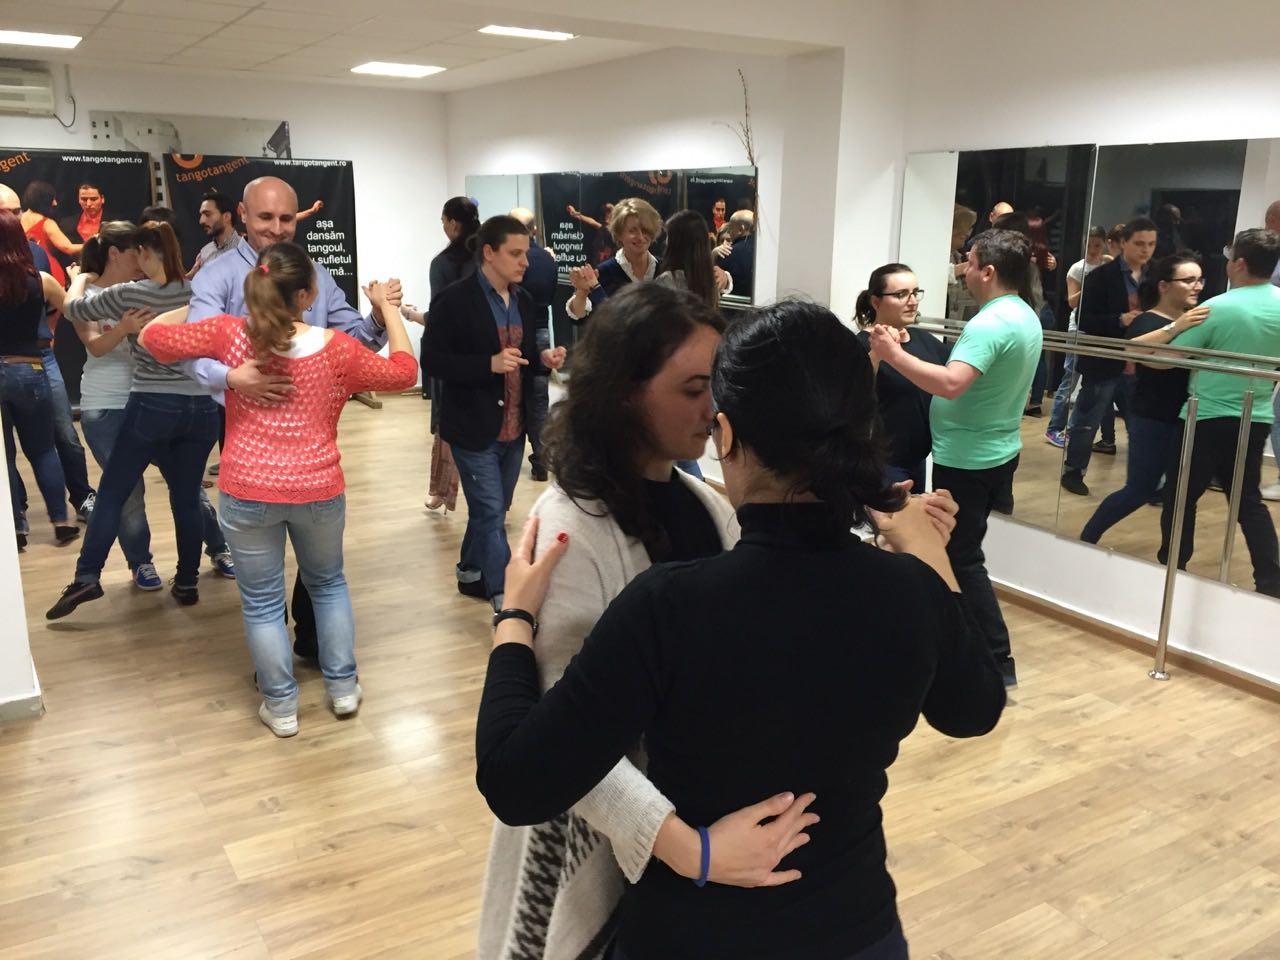 practica-z-by-tangotangent-tango-argentinian